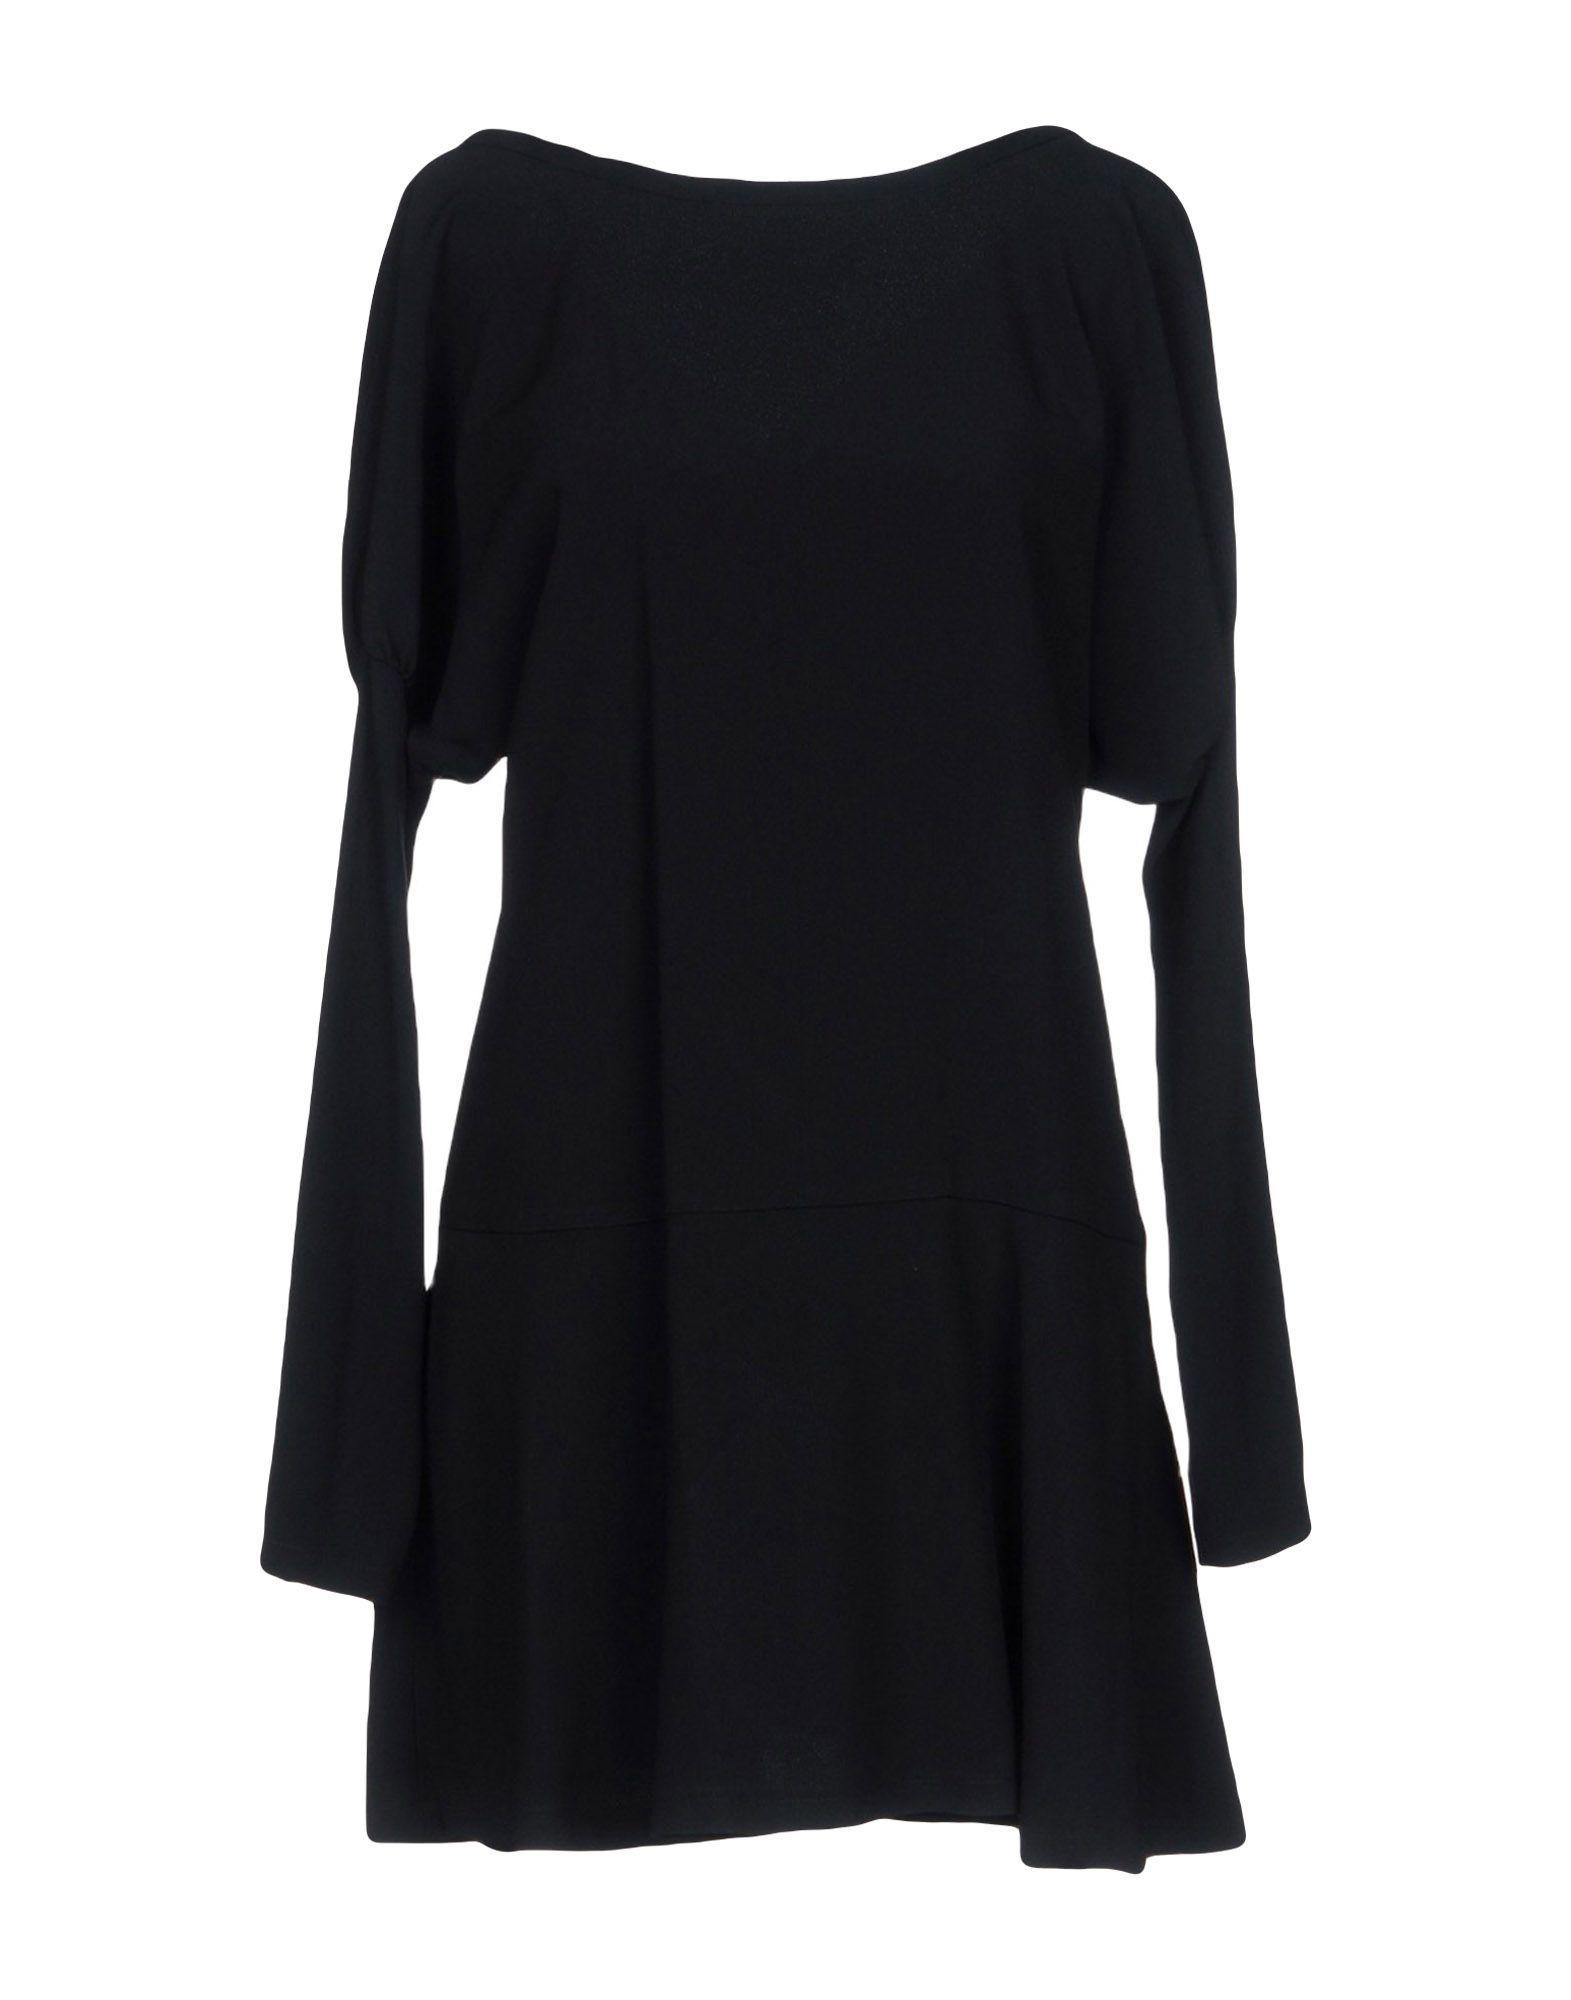 Red Valentino Short Dresses In Black